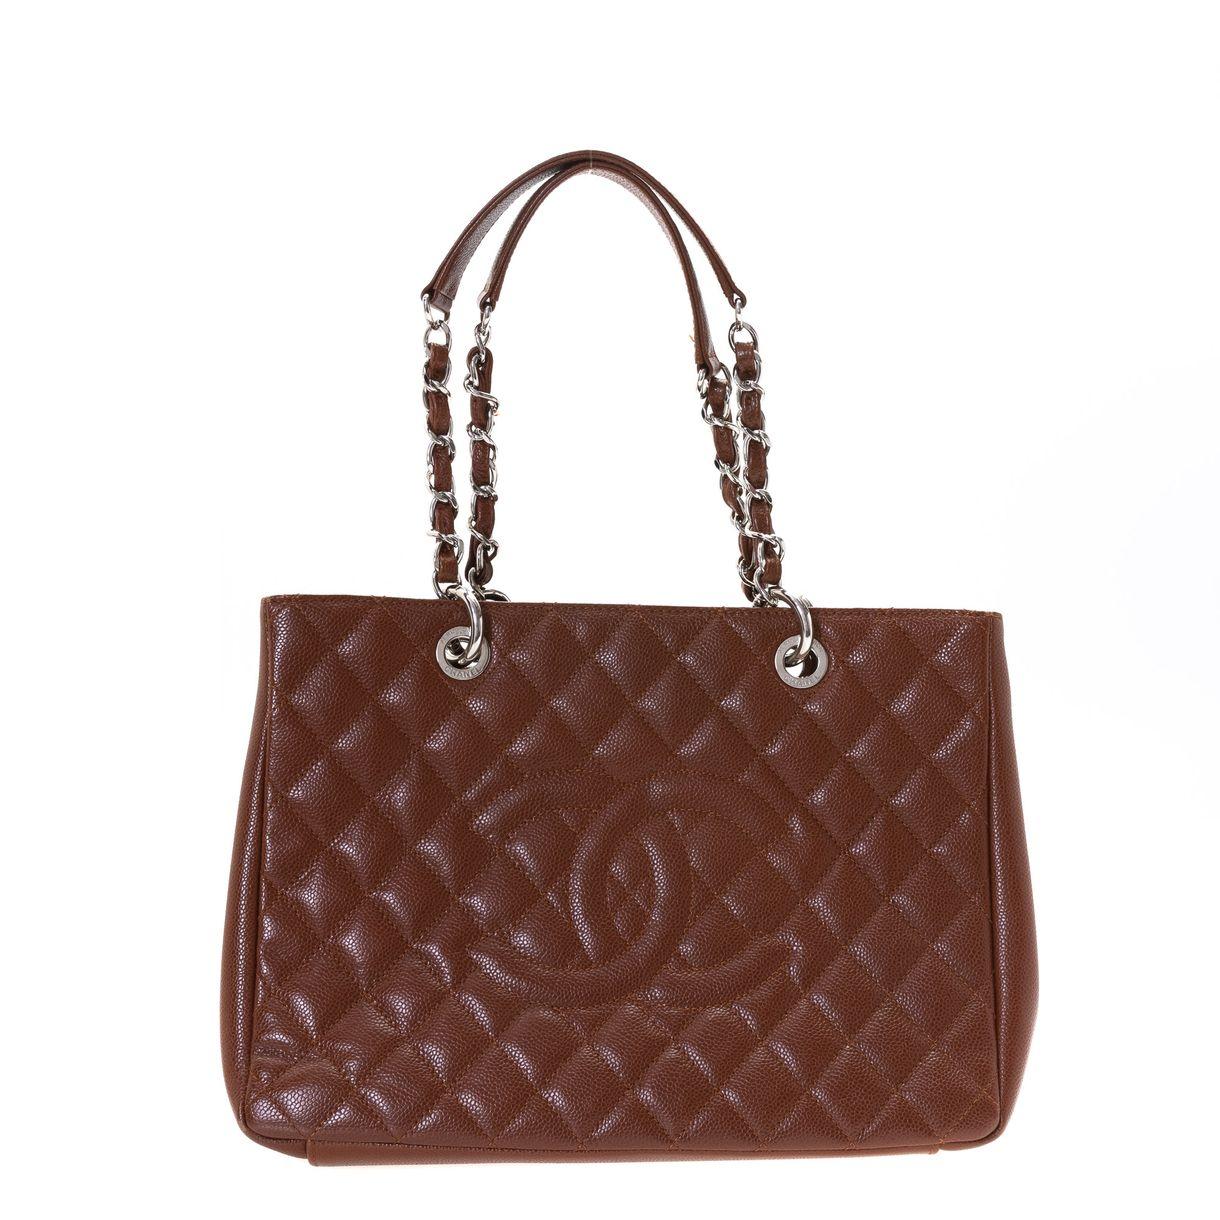 Bolsa-Chanel-Shopper-Caviar-Marrom